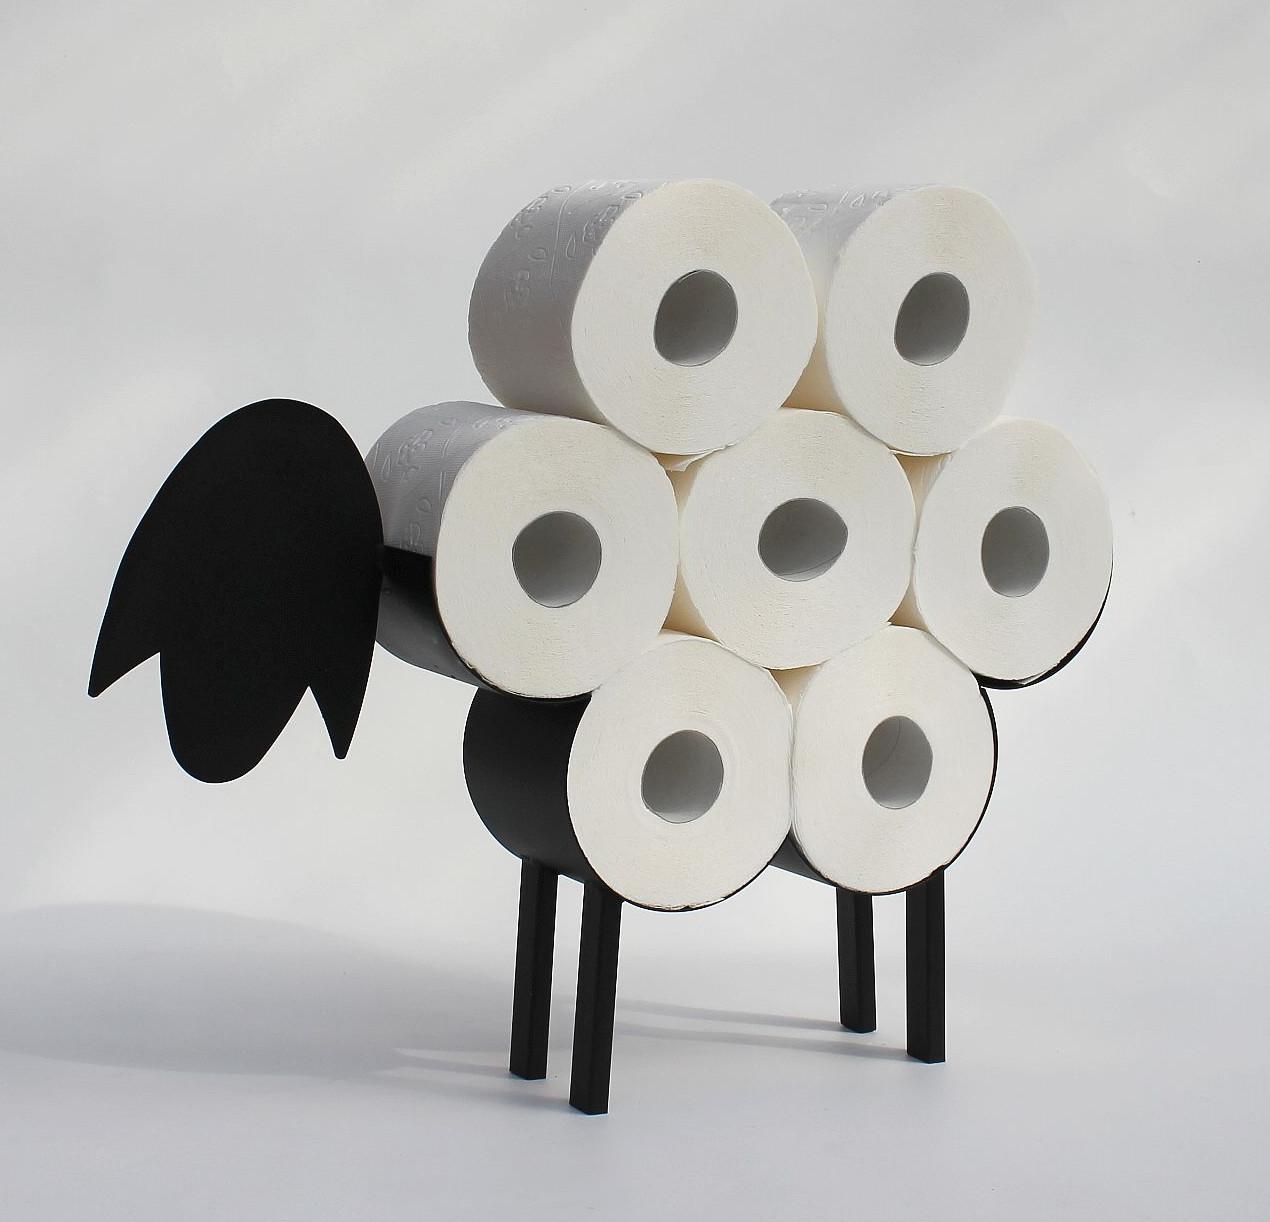 Dandibo Toilettenpapierhalter Schwarz Metall Schaf Wc